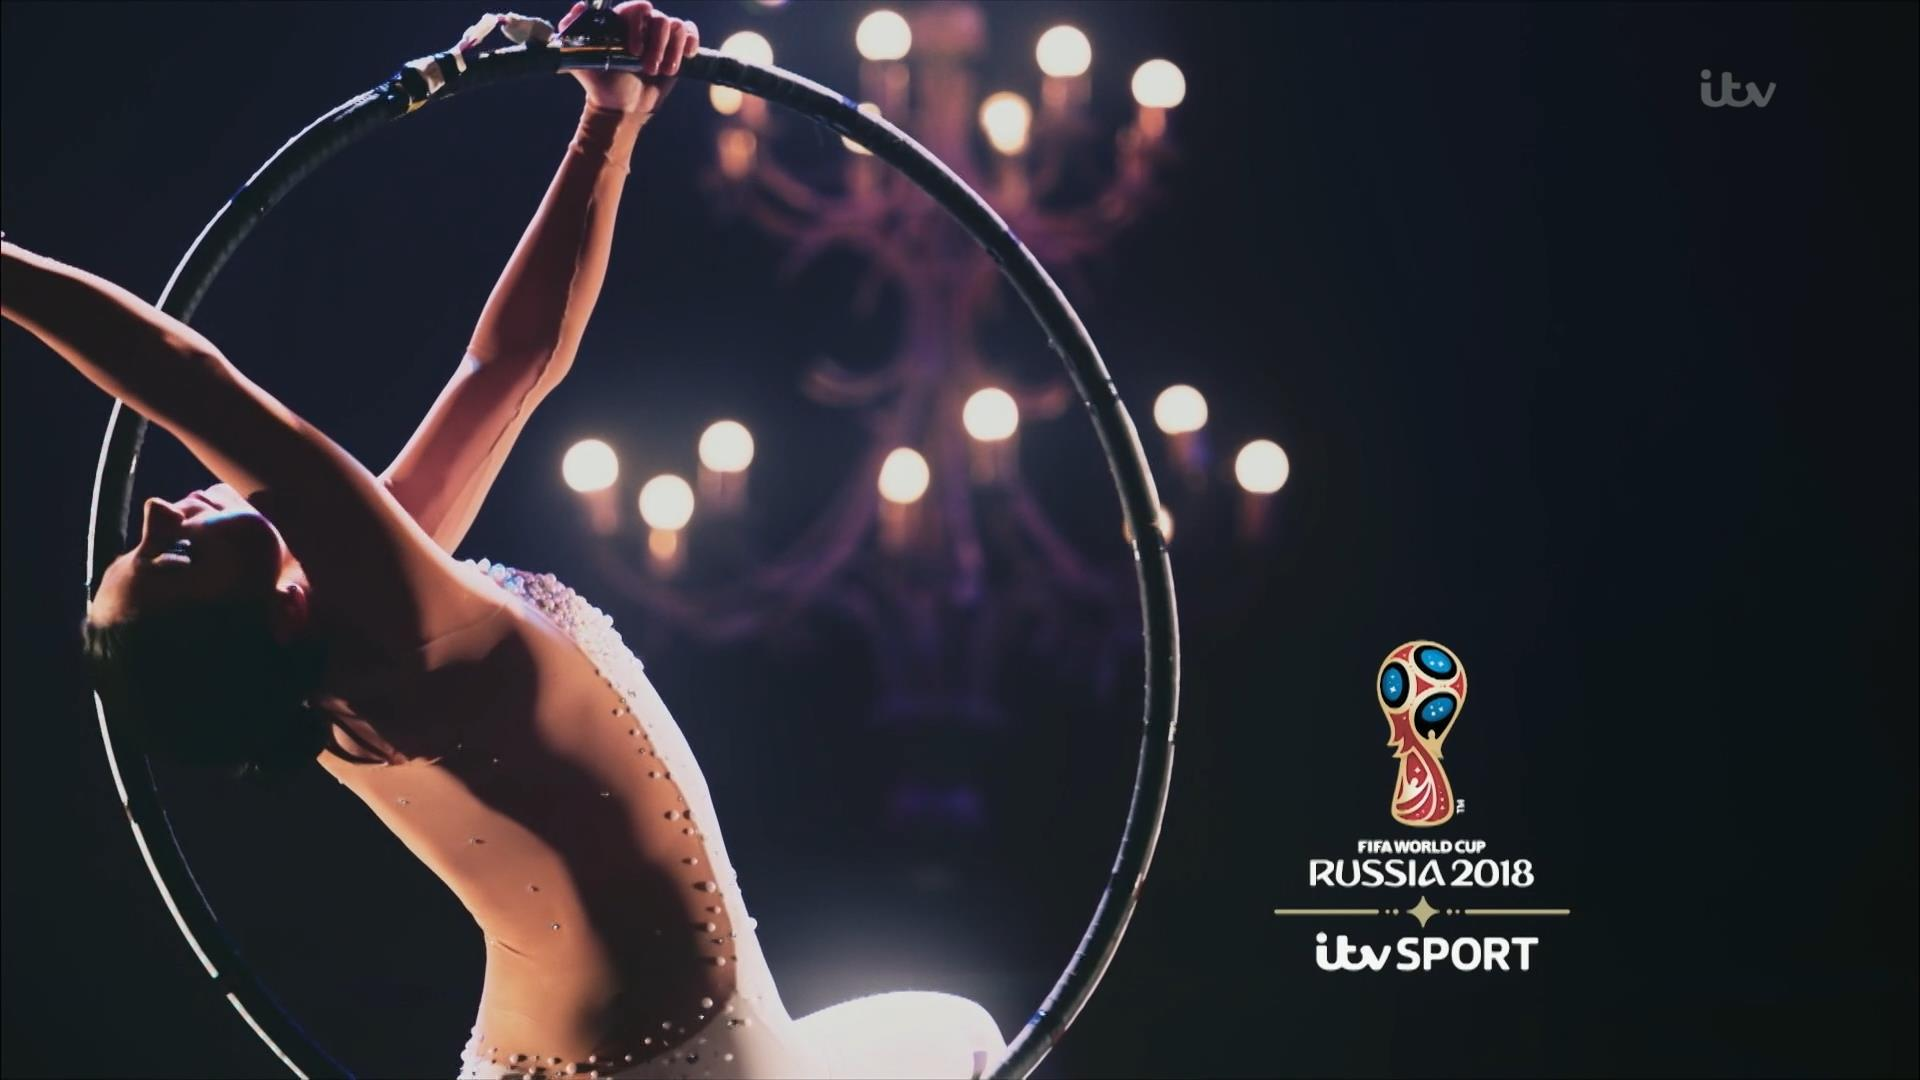 World Cup 2018 – ITV Presentation